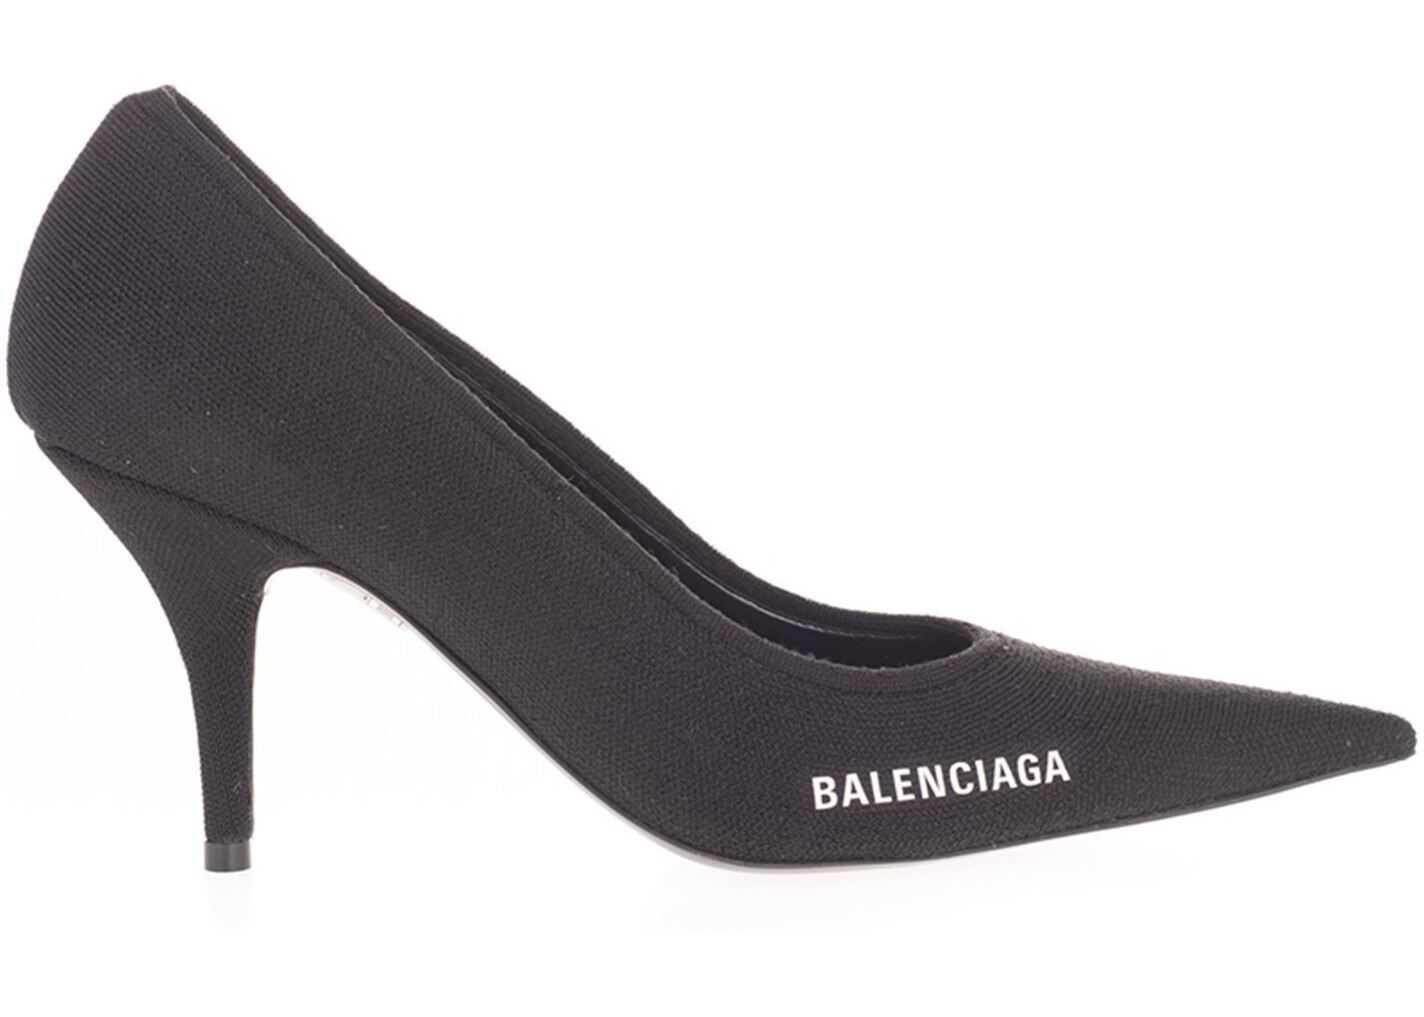 Balenciaga Knife Knit Pumps In Black 628602 W1802 1090 Black imagine b-mall.ro